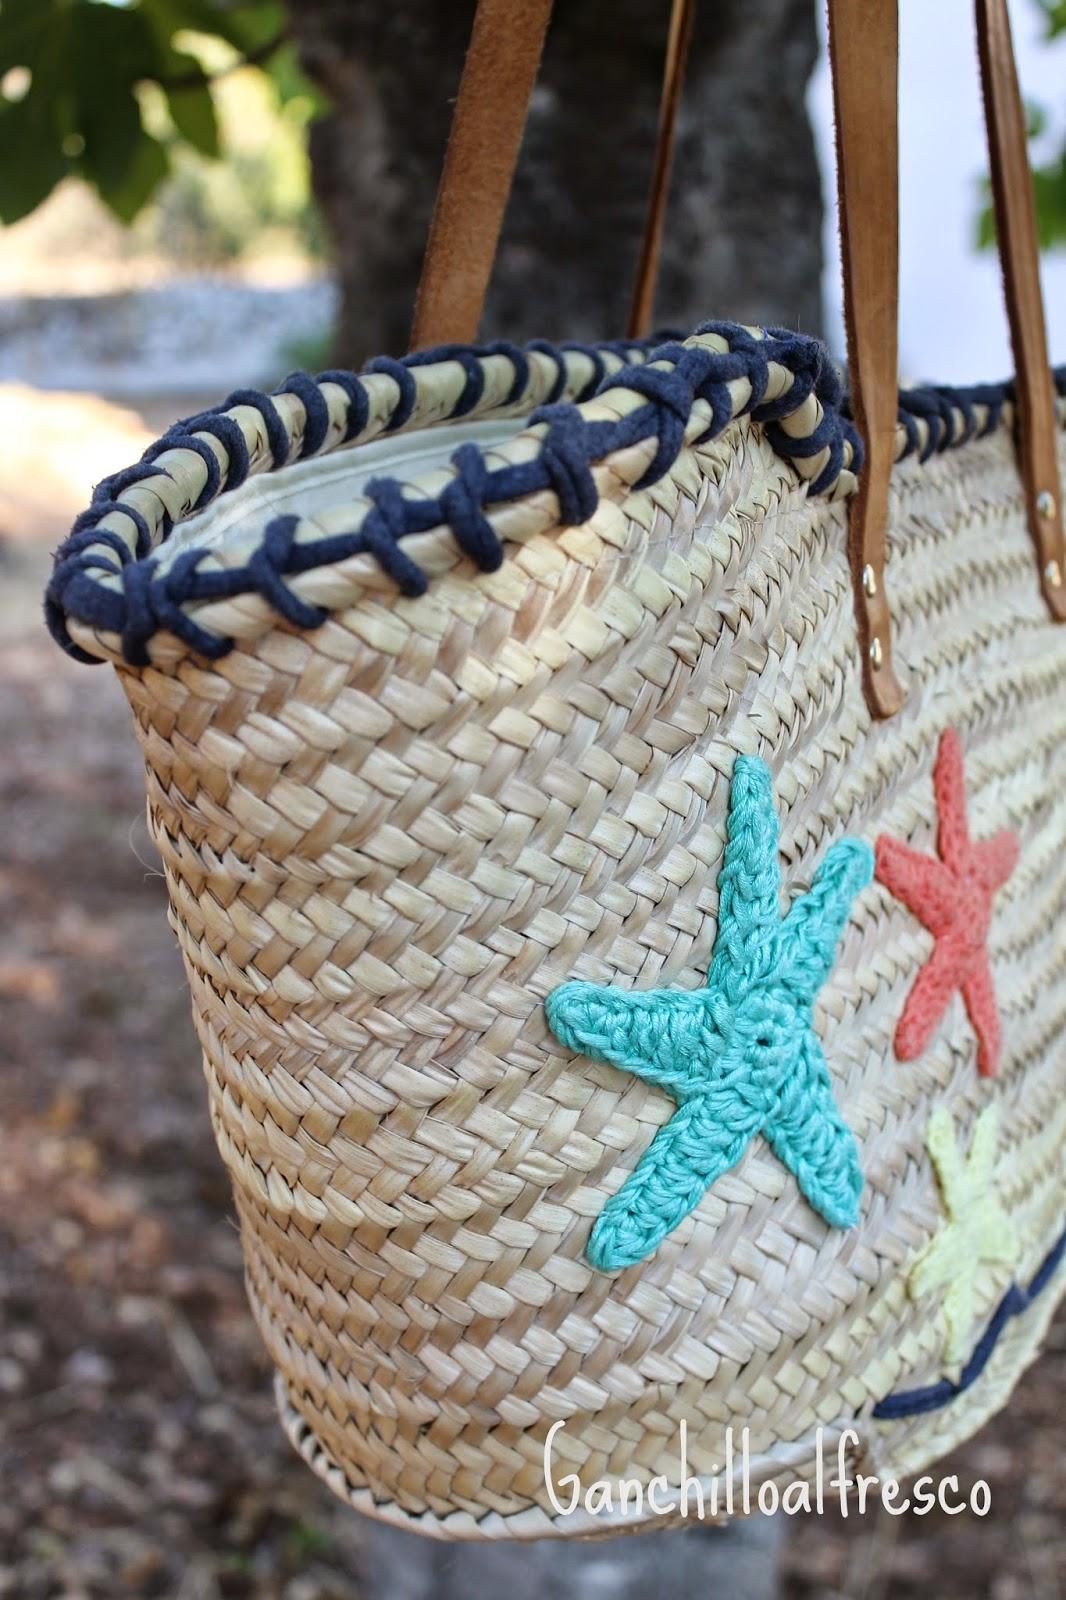 Ganchillo al fresco la cesta del verano - Cestas de ganchillo ...